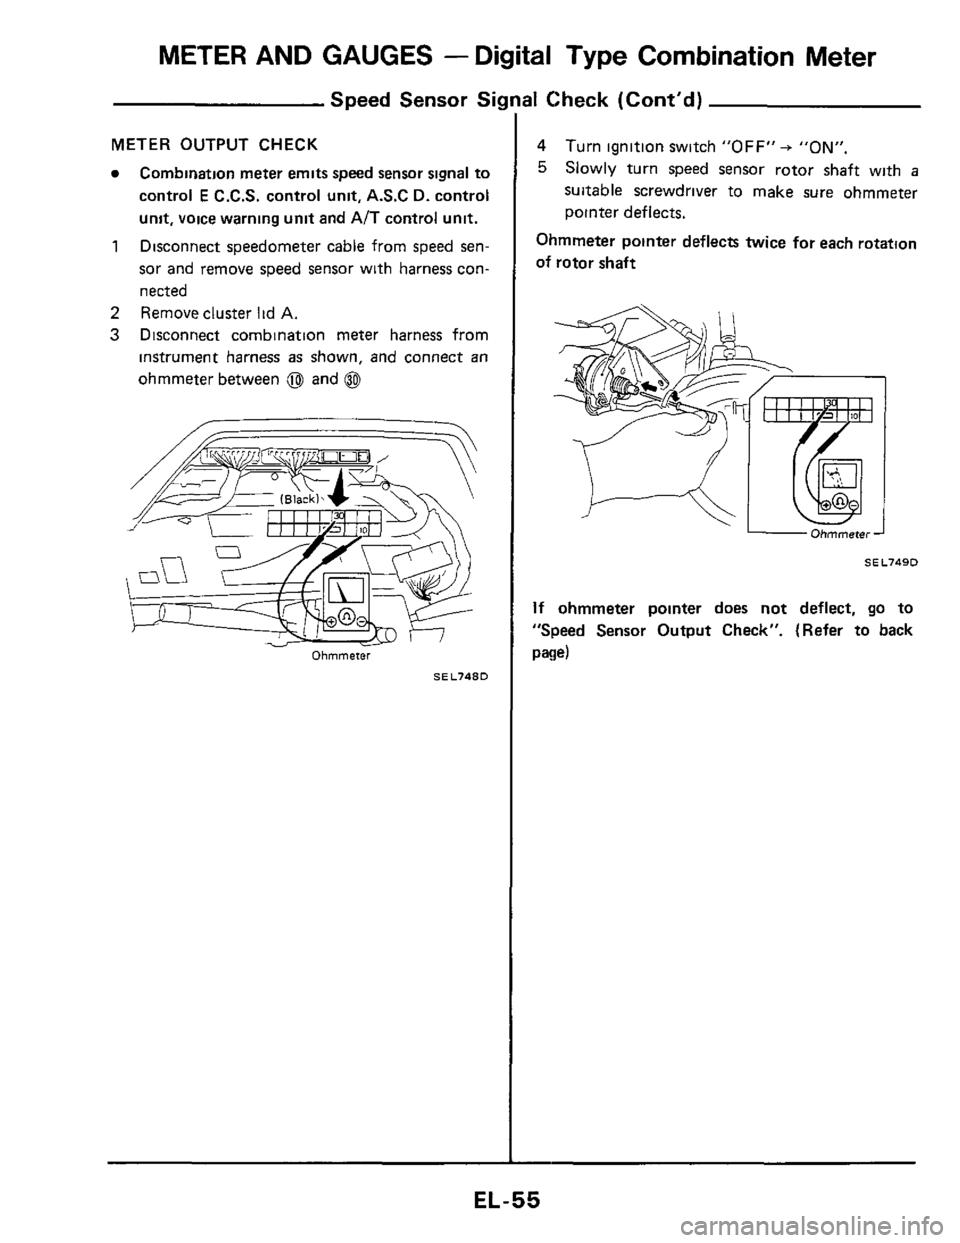 Nissan 300zx 1984 Z31 Electrical System Workshop Manual, Page 55